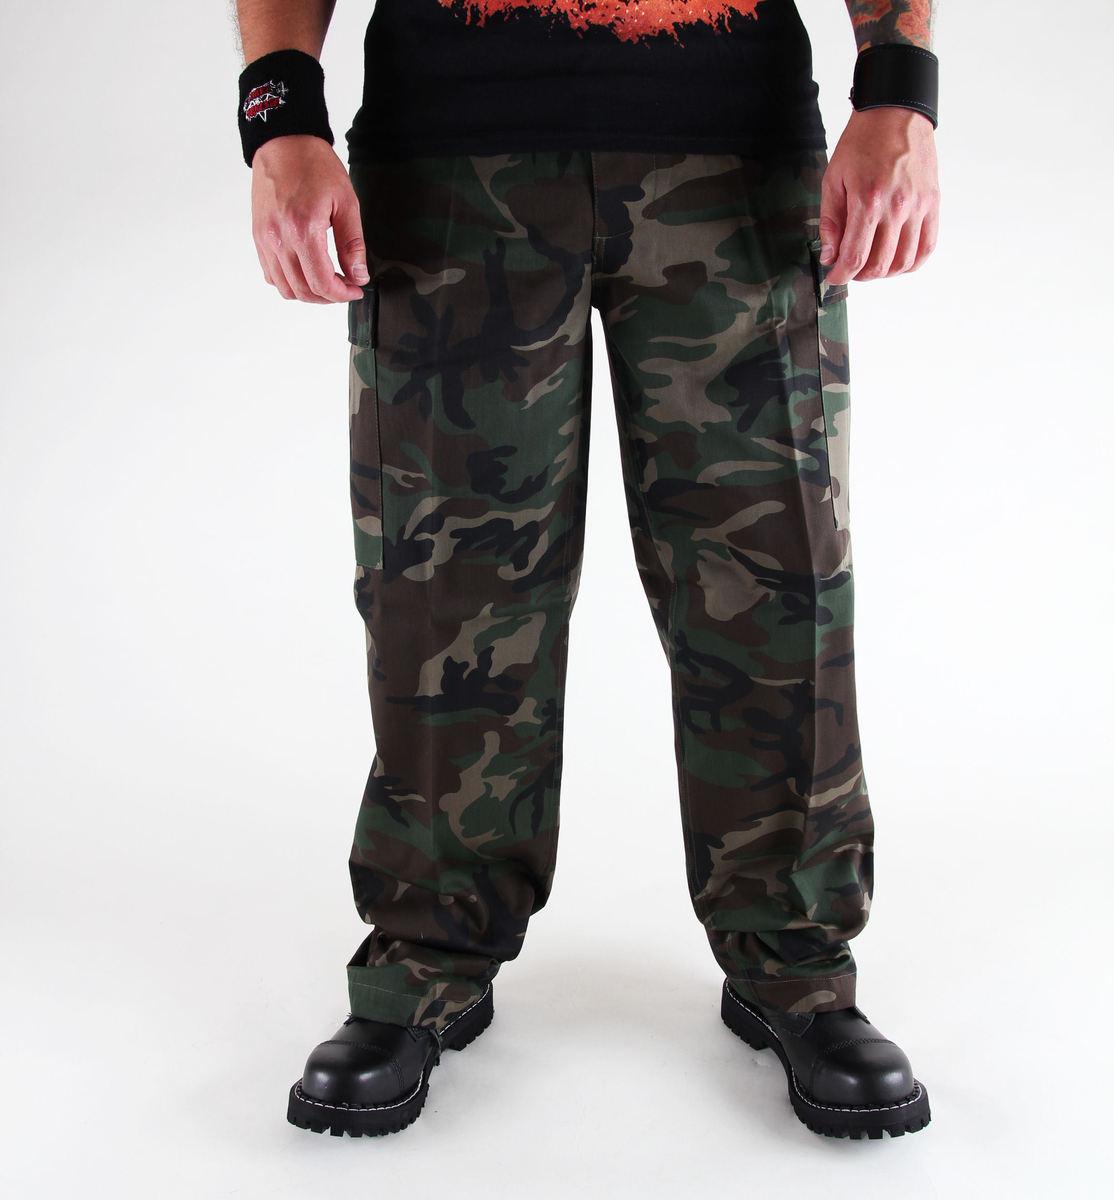 kalhoty pánské BRANDIT - US Ranger Hose Woodland - 1006/10